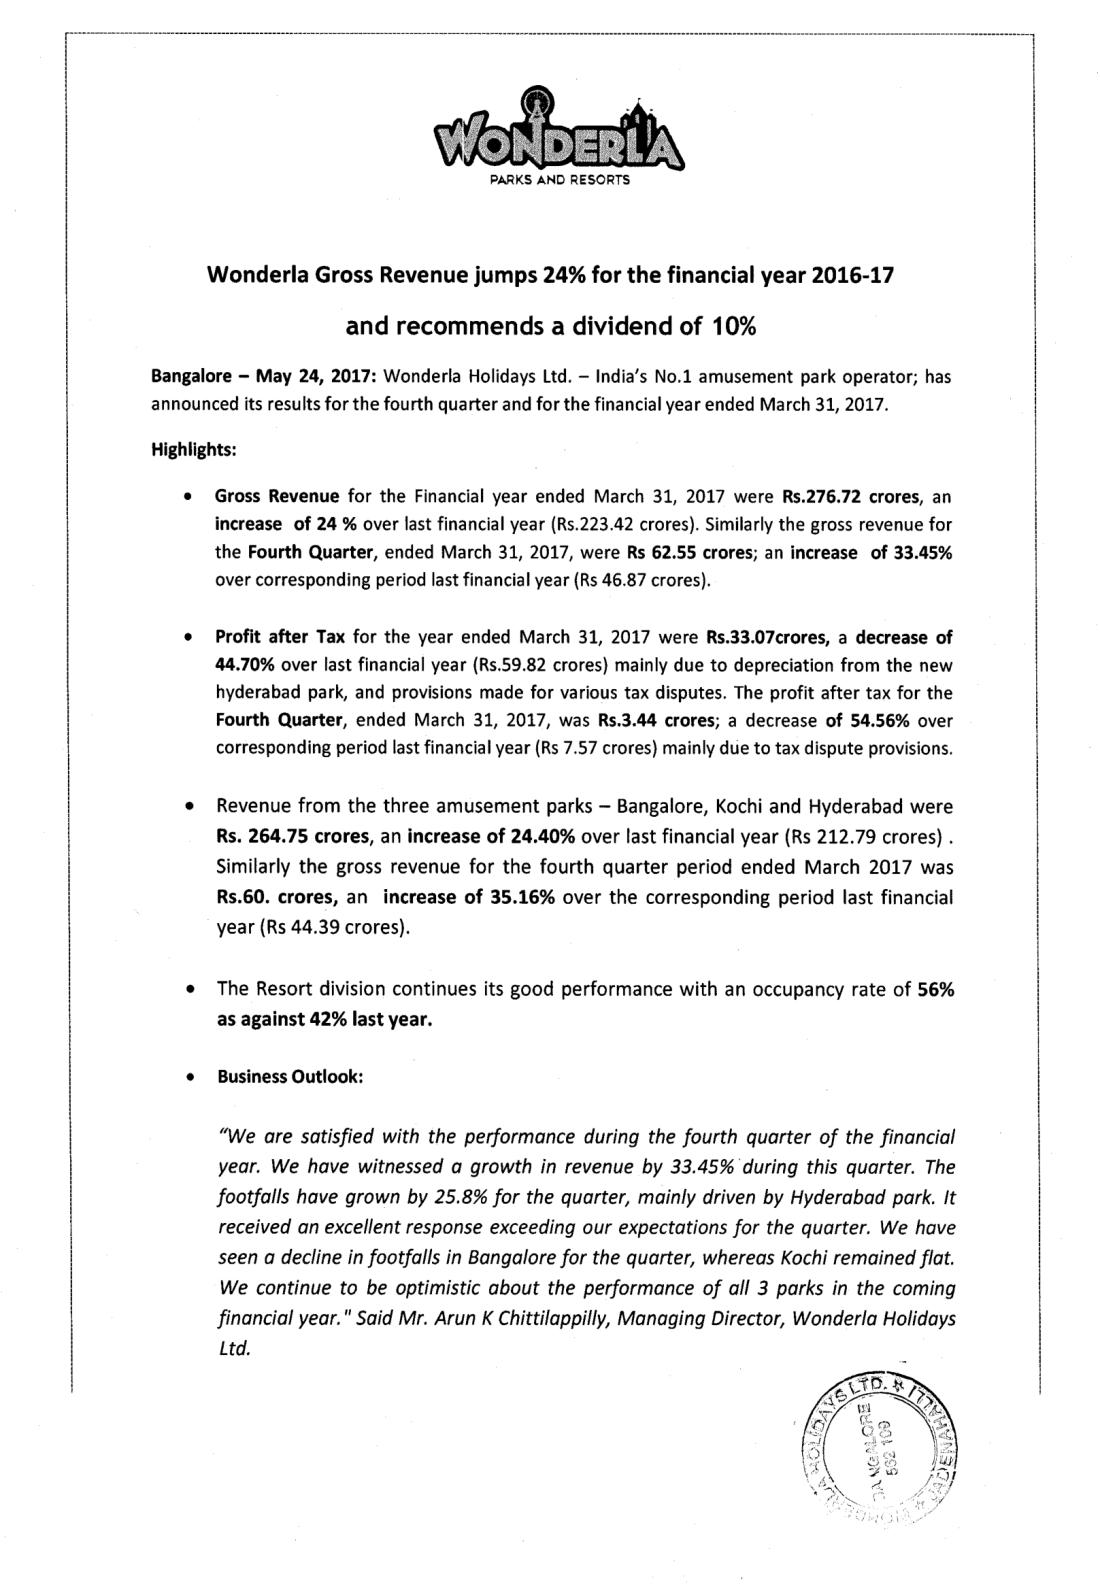 Wonderla Amusement Parks & Resort  Press Release - Financial results - 24.05.2017-1